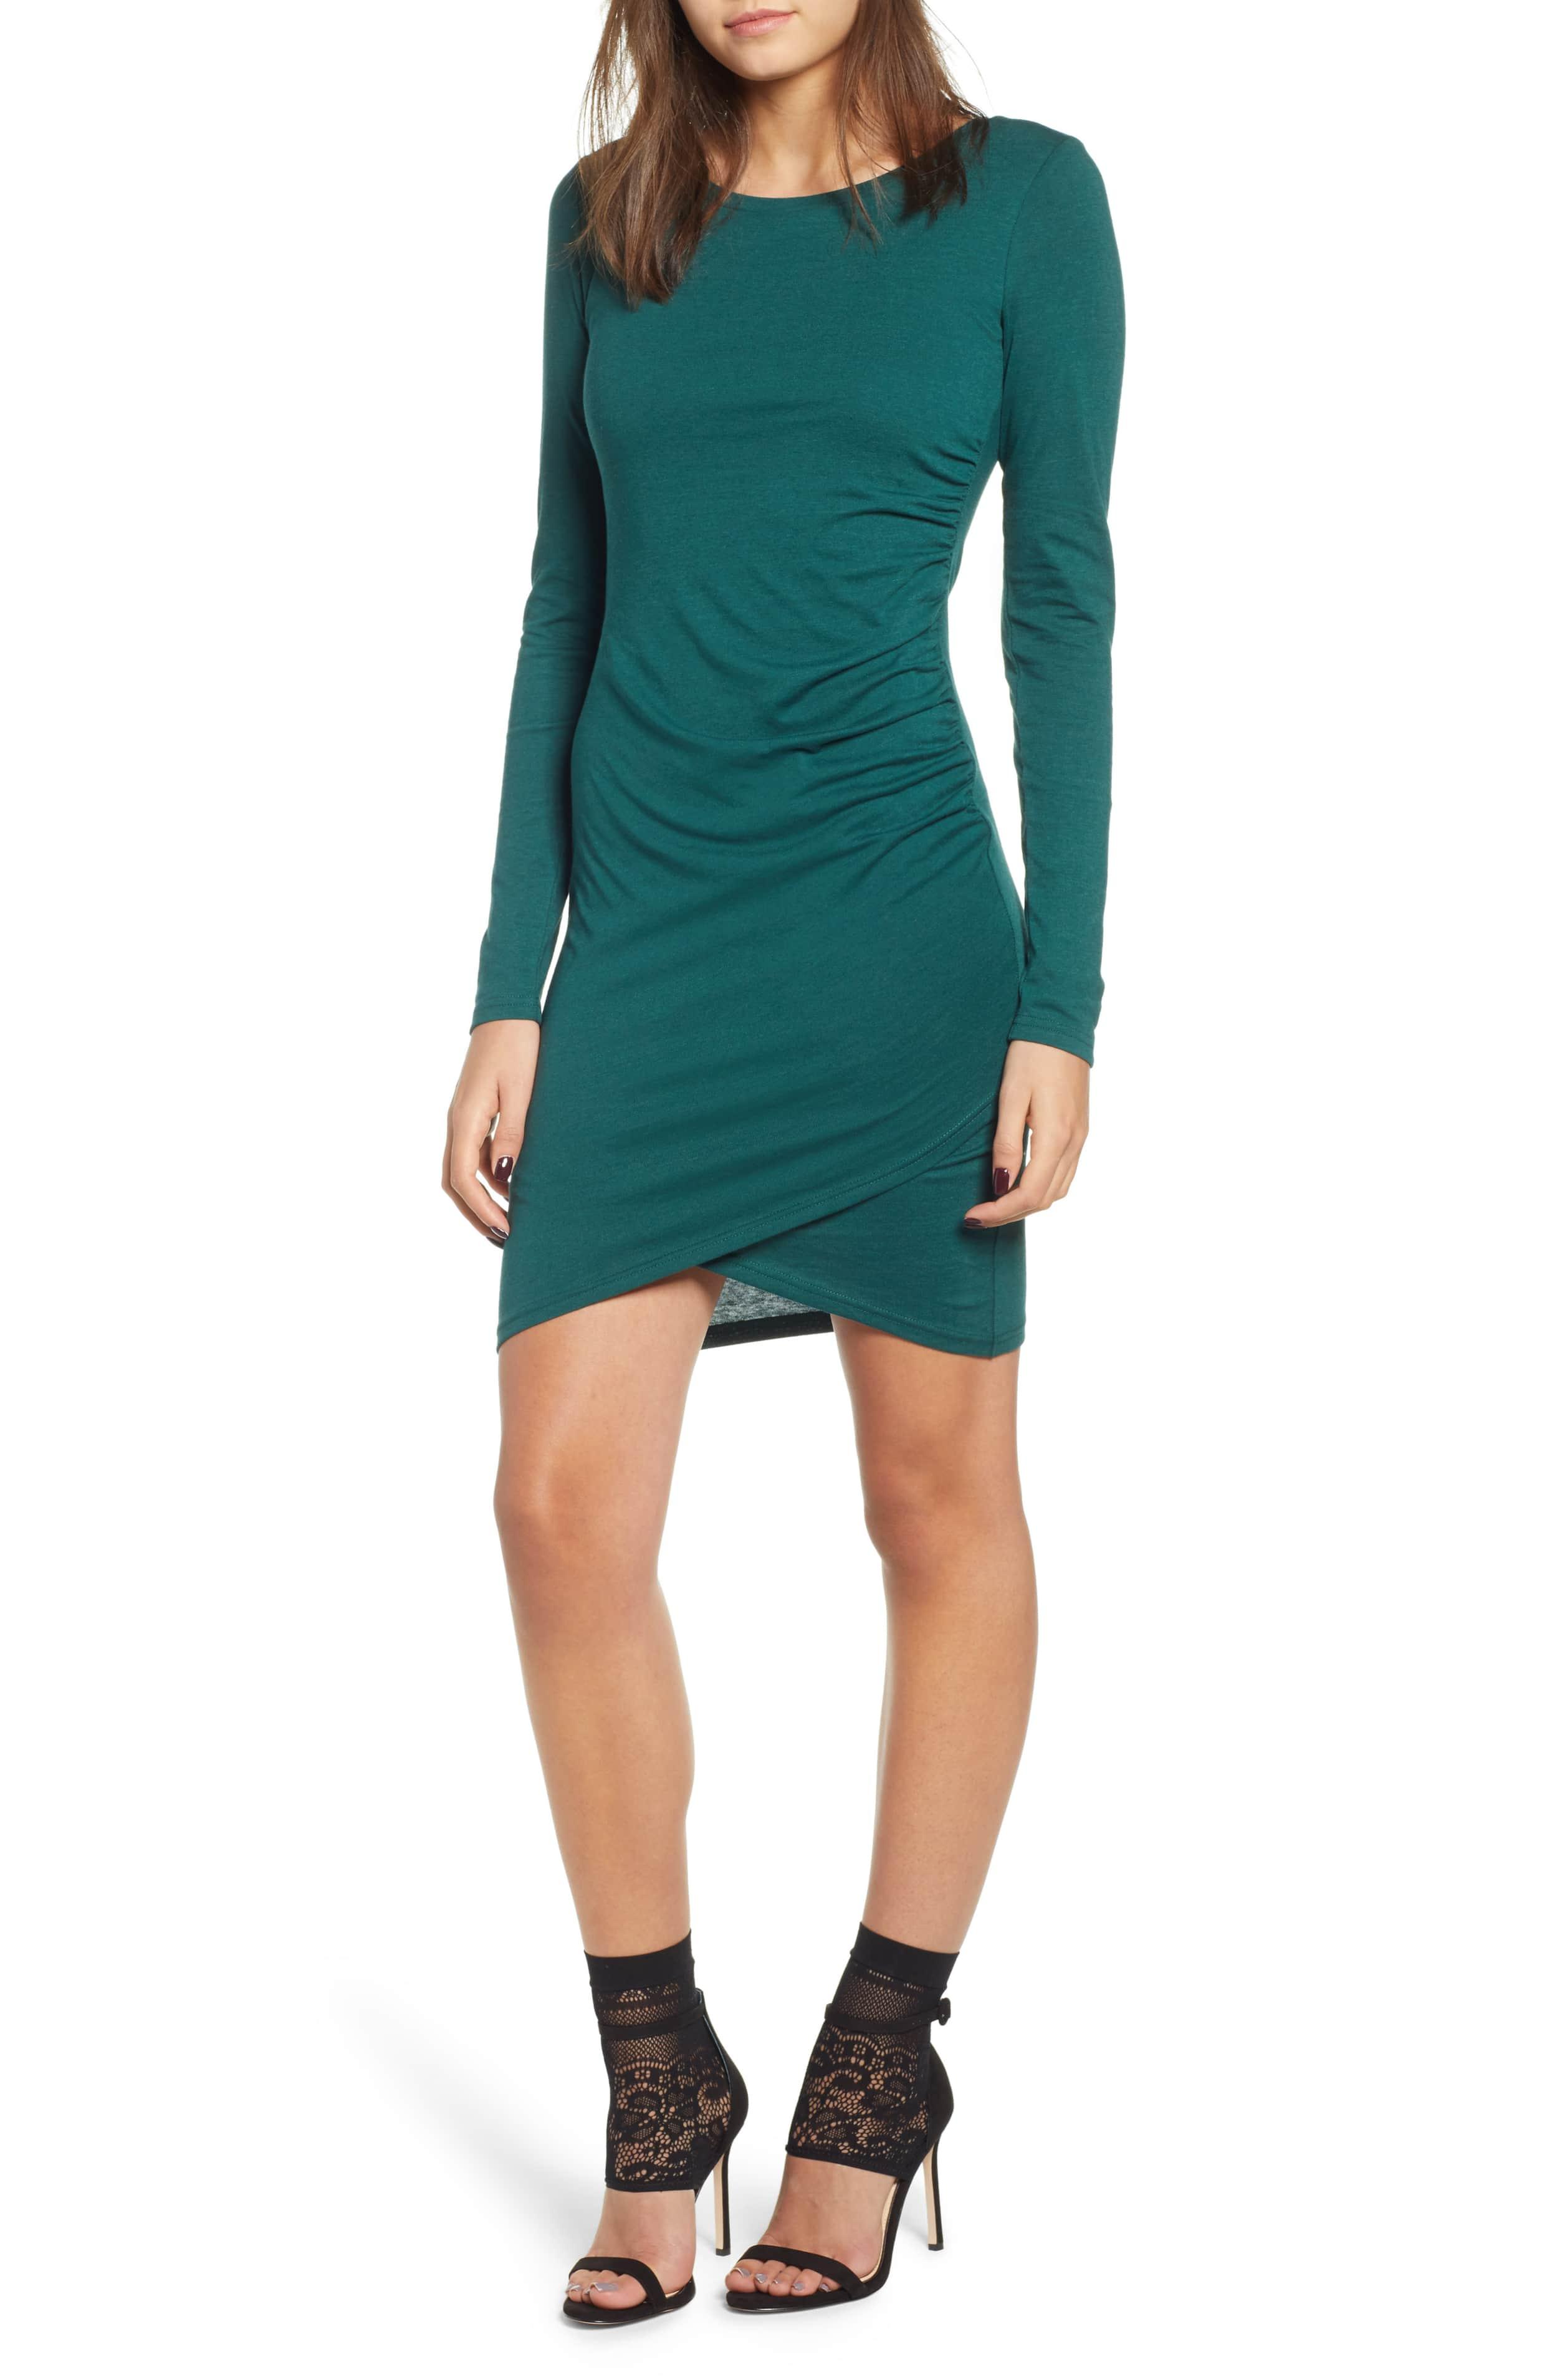 Nordstrom Bodycon Dresses Fashion Dresses